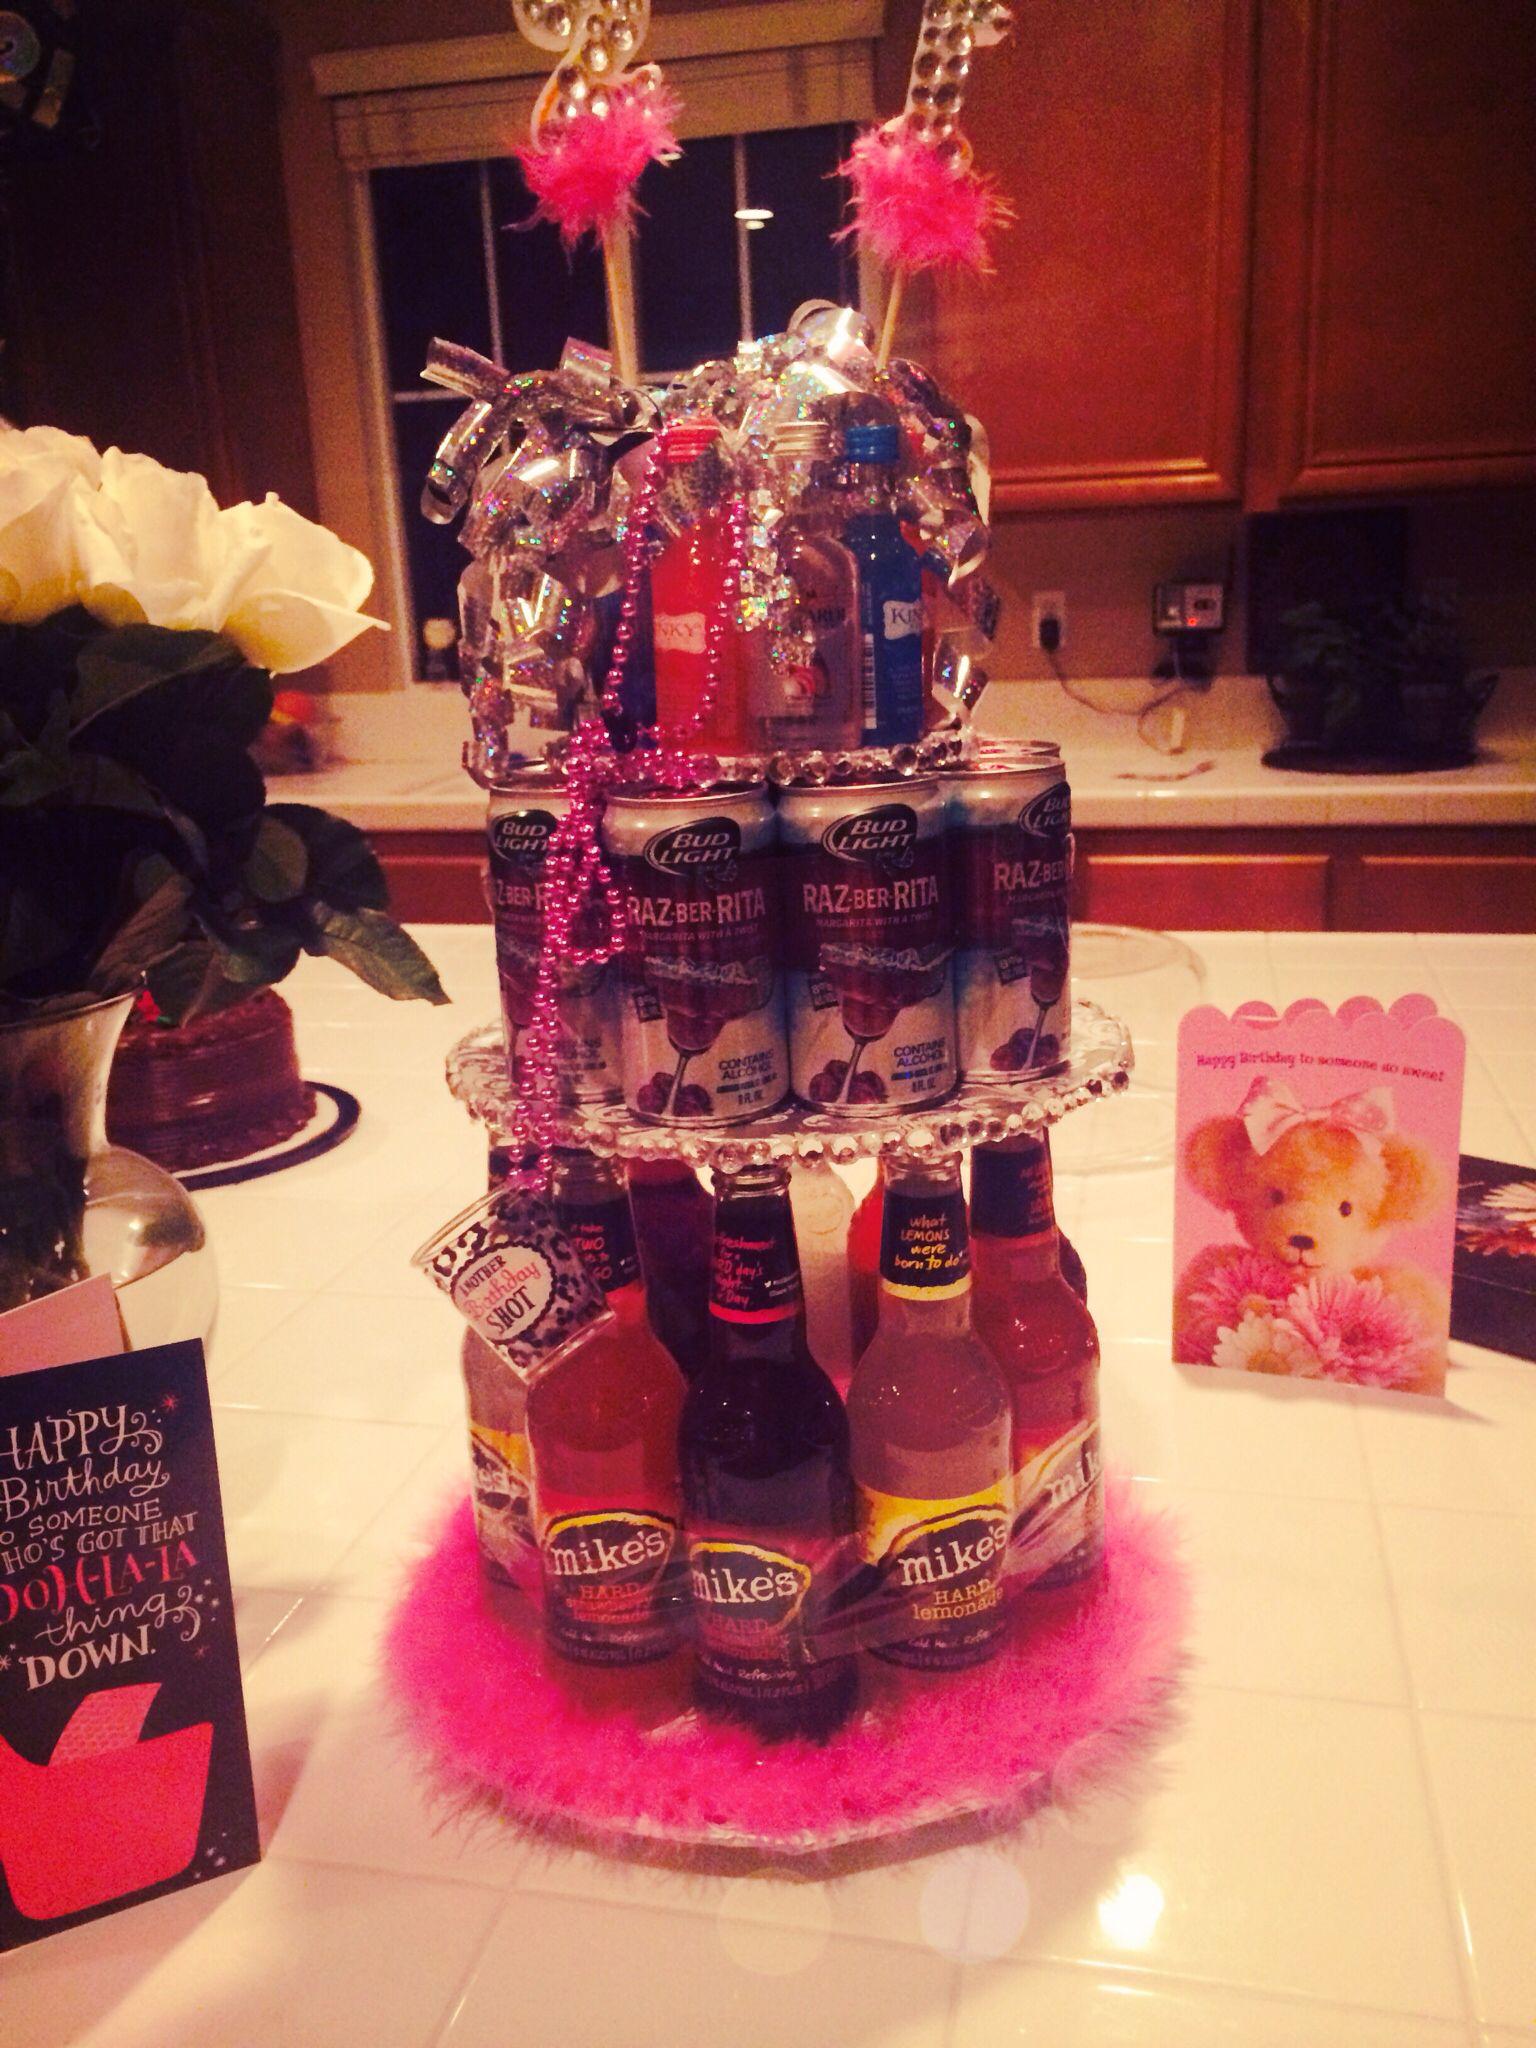 21st birthday cake #21 #alcohol | 21st birthday cakes ...